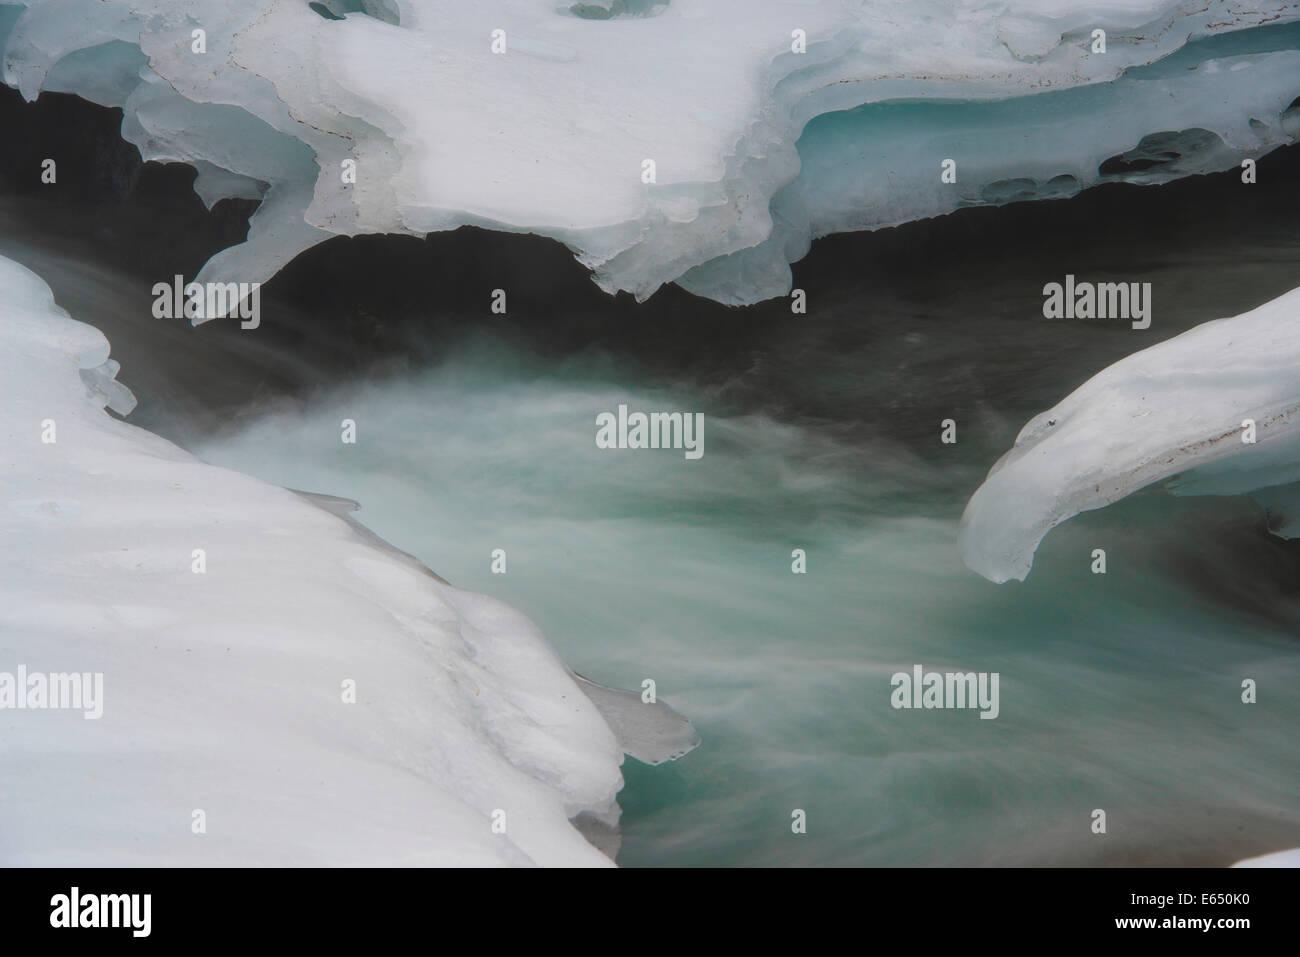 Ice sculptures, Krimml Waterfalls, Krimml, Zell am See District, High Tauern National Park, Salzburg, Austria Stock Photo